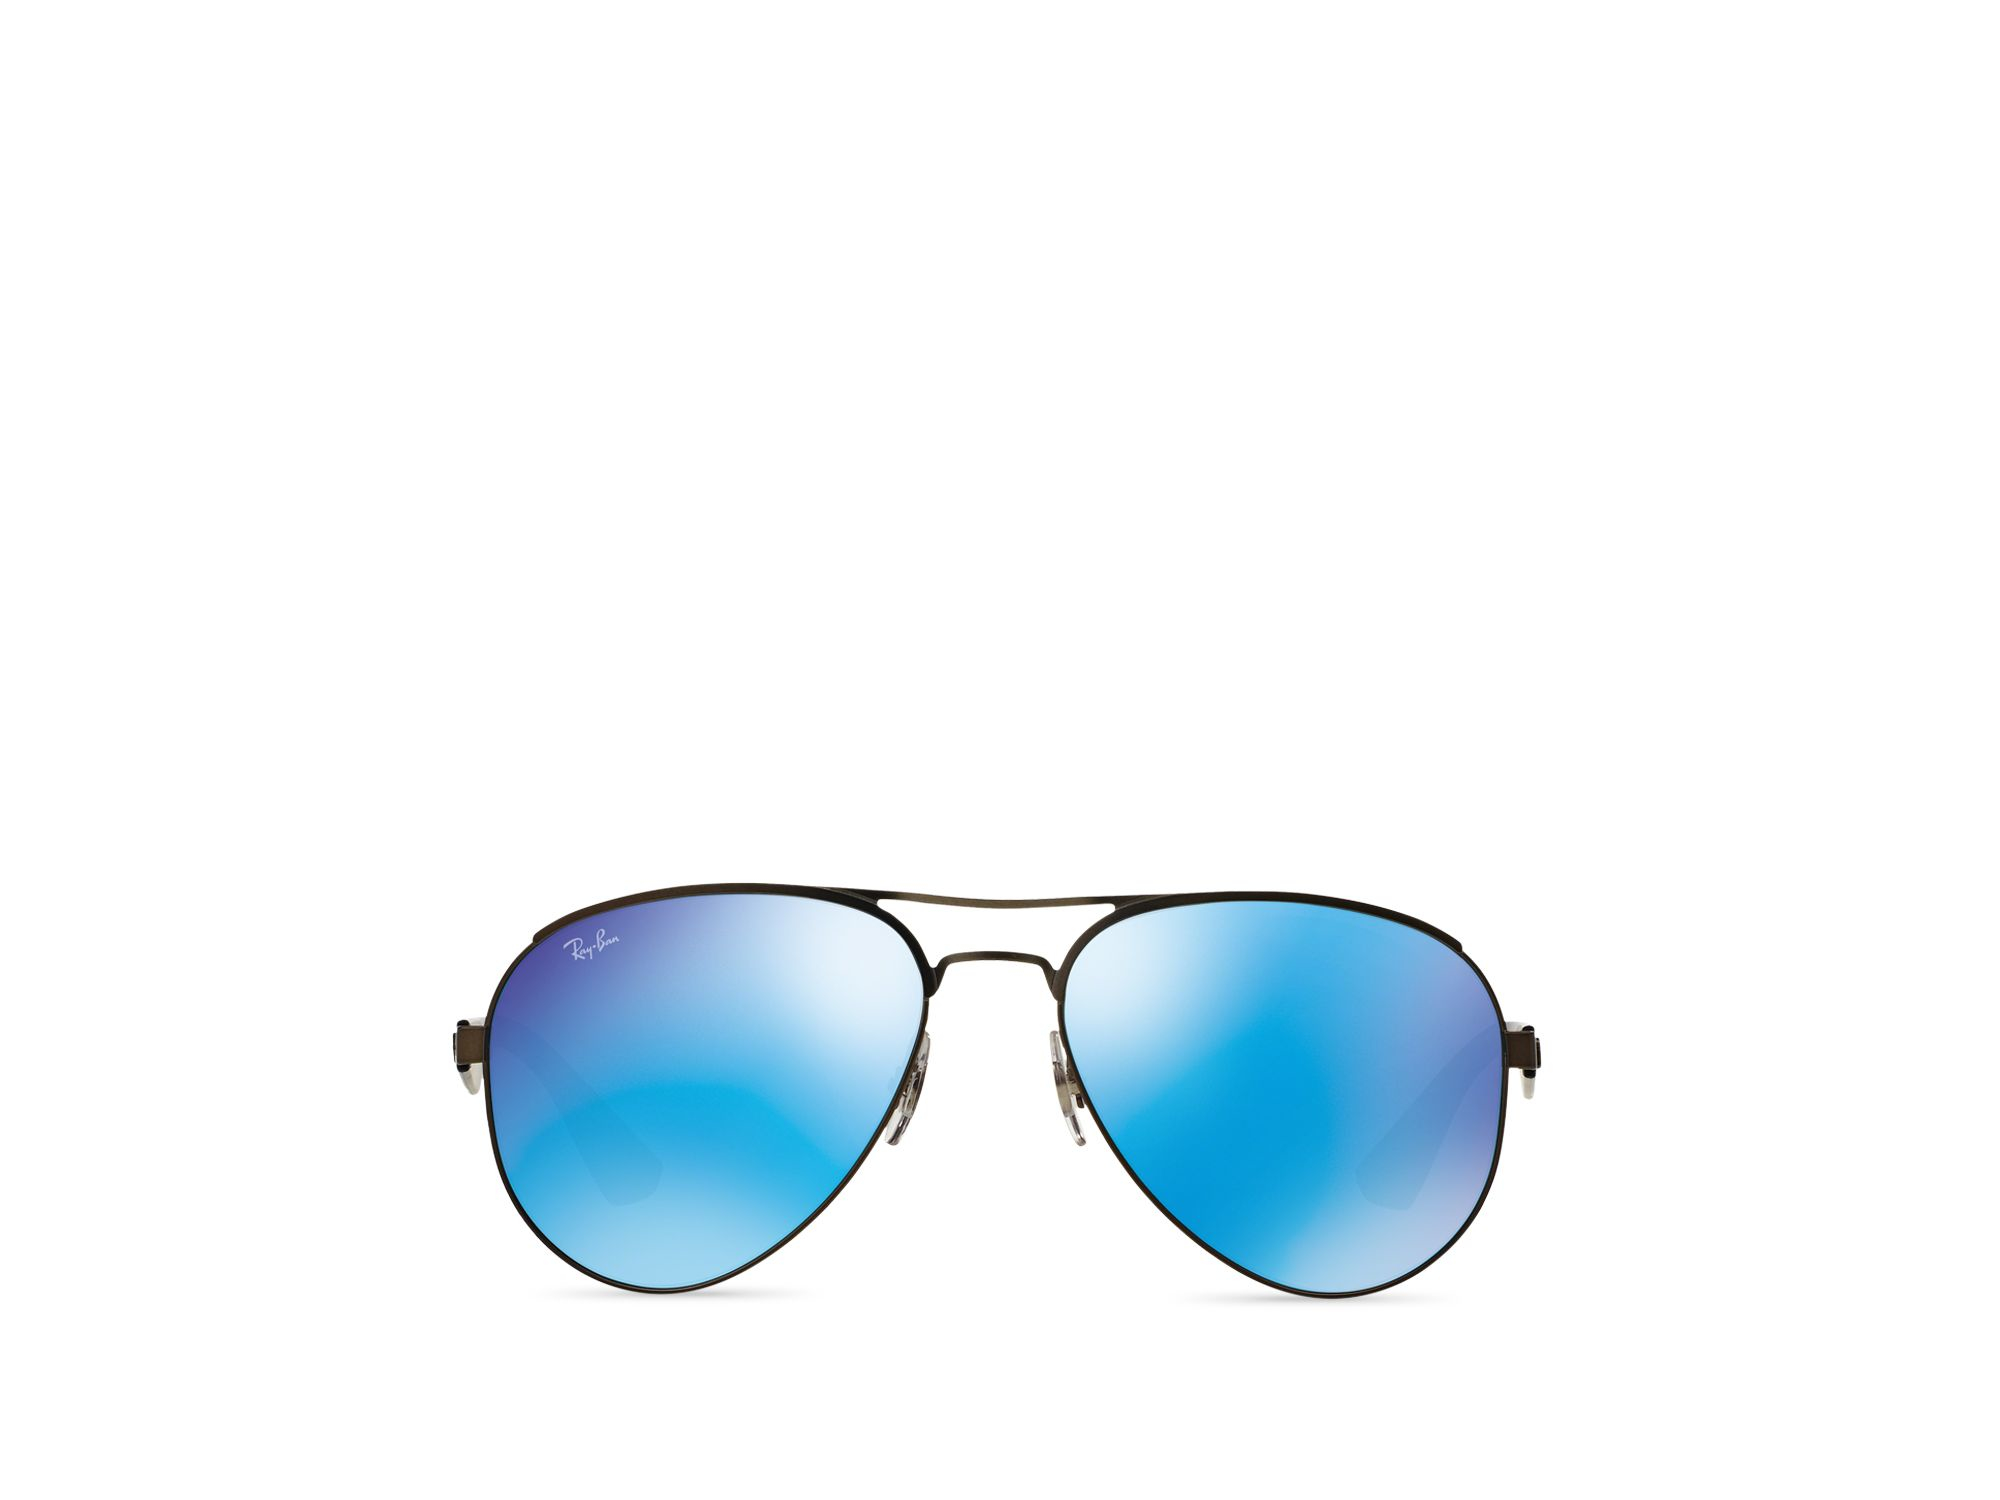 1b2e49d788 Ray-ban Highstreet Rb3523 59mm Aviator Mirror Sunglasses